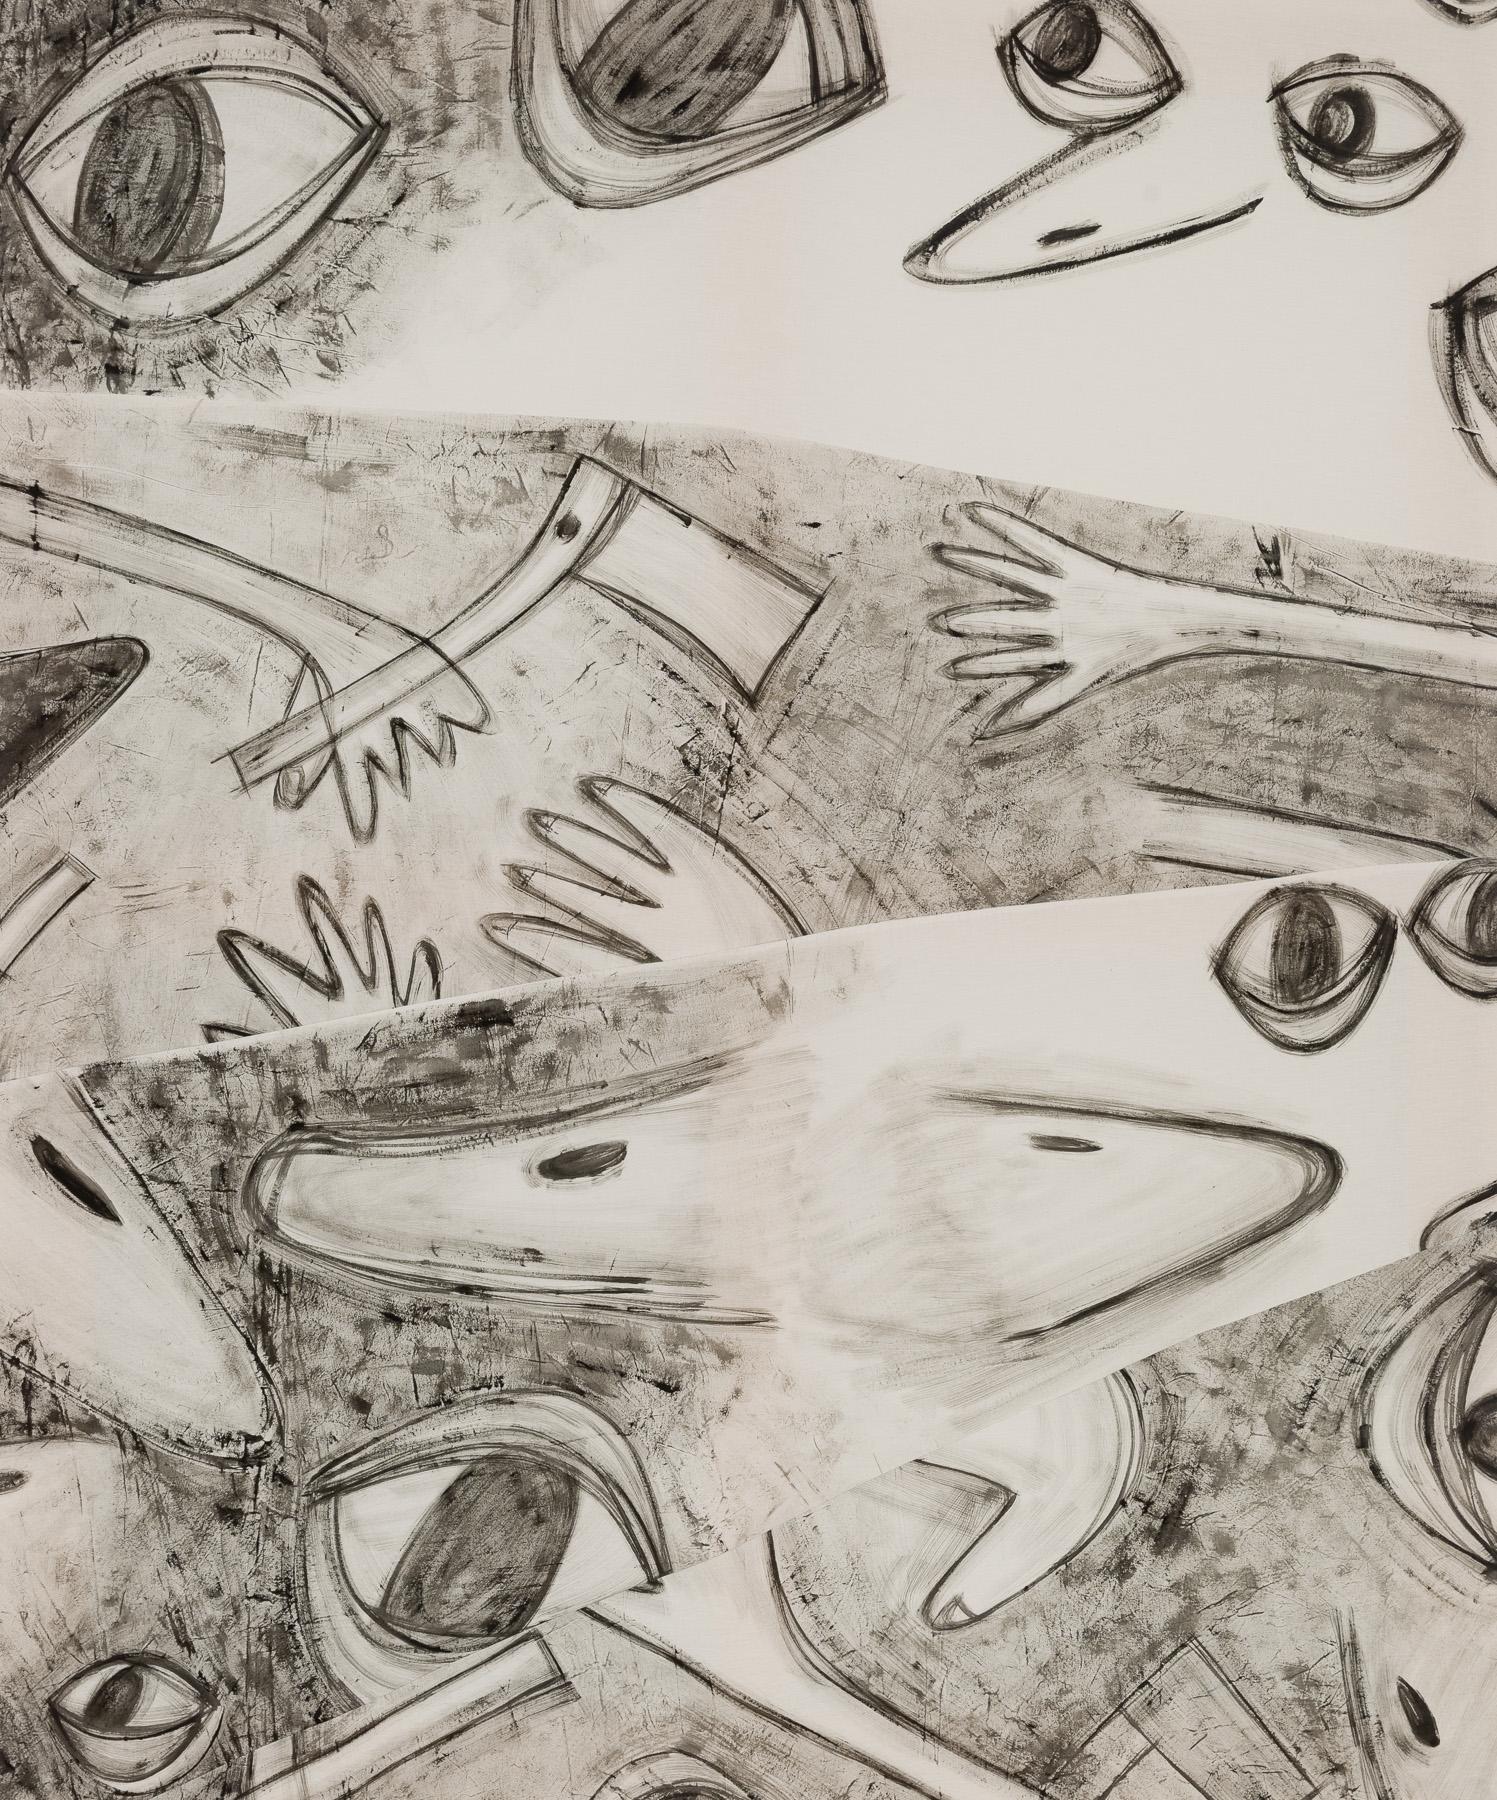 Chance objects  ,2017, acrylic on muslin, 72x60 in